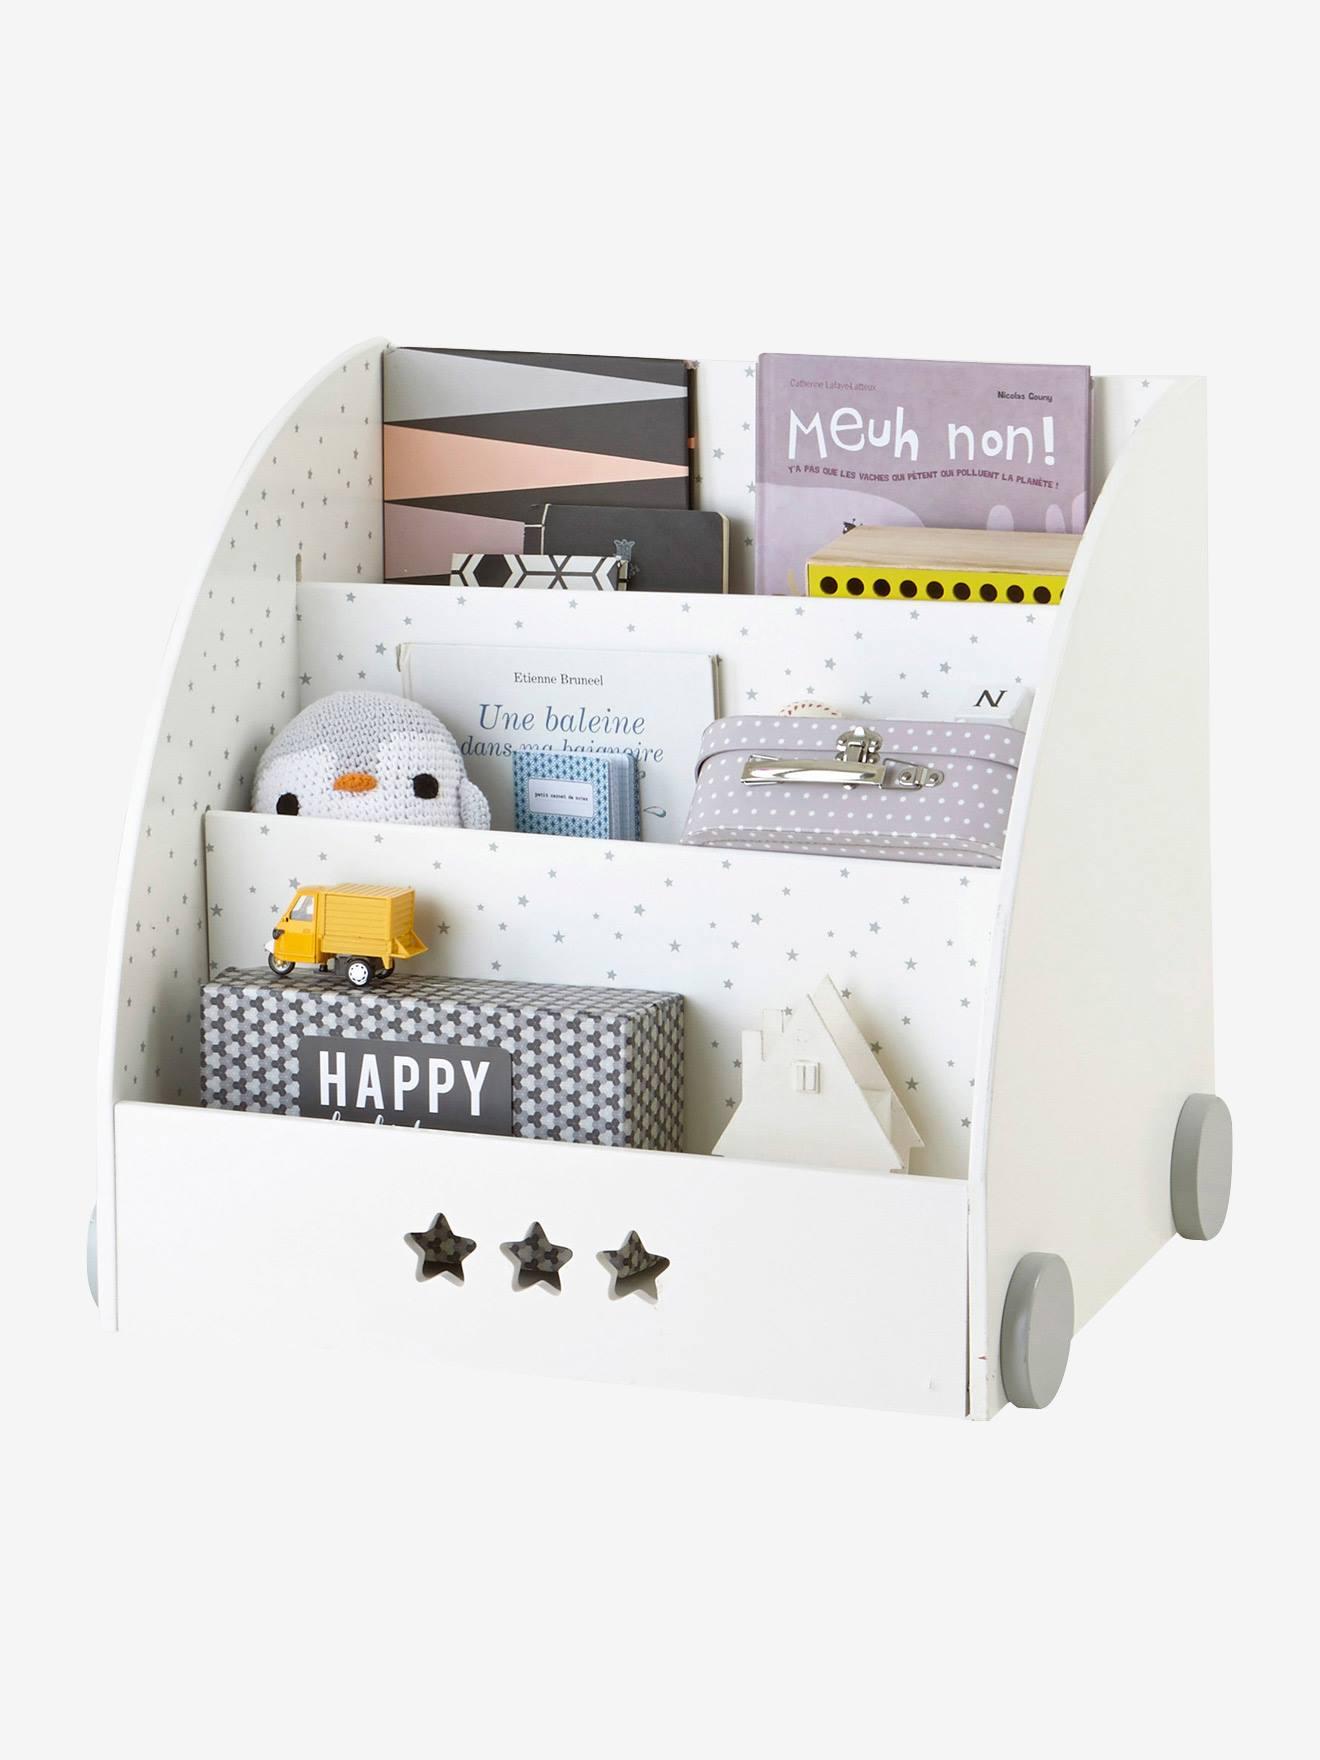 mobile bookcase, sirius theme, storage & decoration | vertbaudet, Hause deko